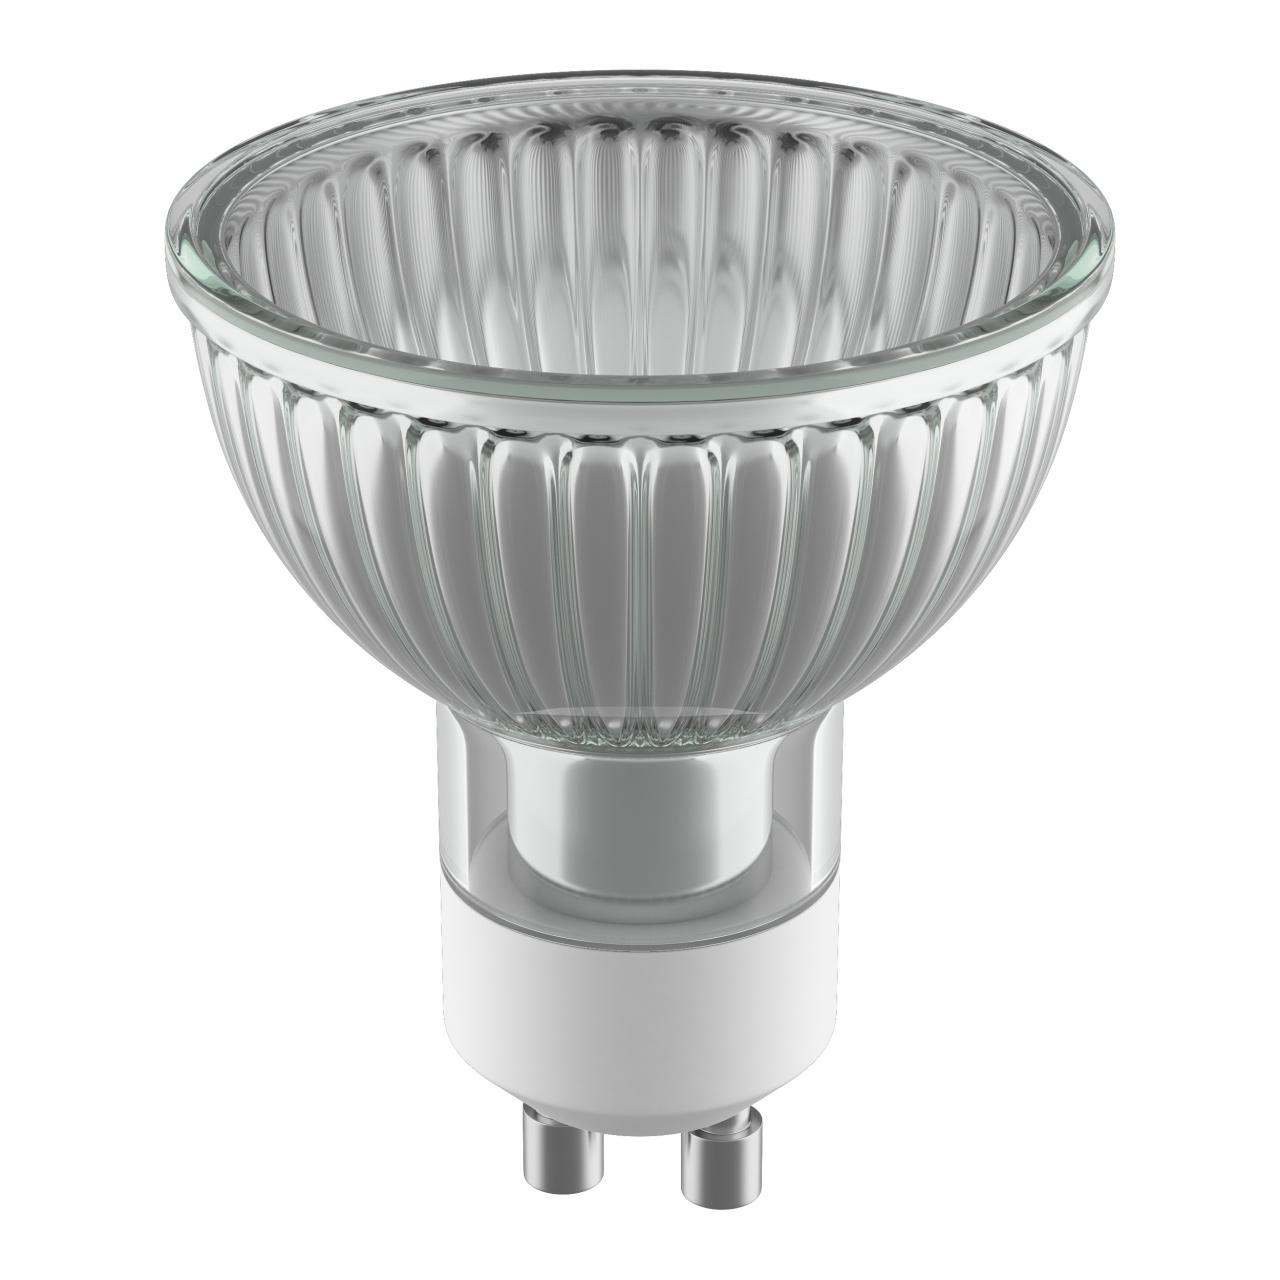 Лампа HAL 220V HP16 GU10 50W 40G ALU RA100 2800K 2000H DIMM Lightstar 922707